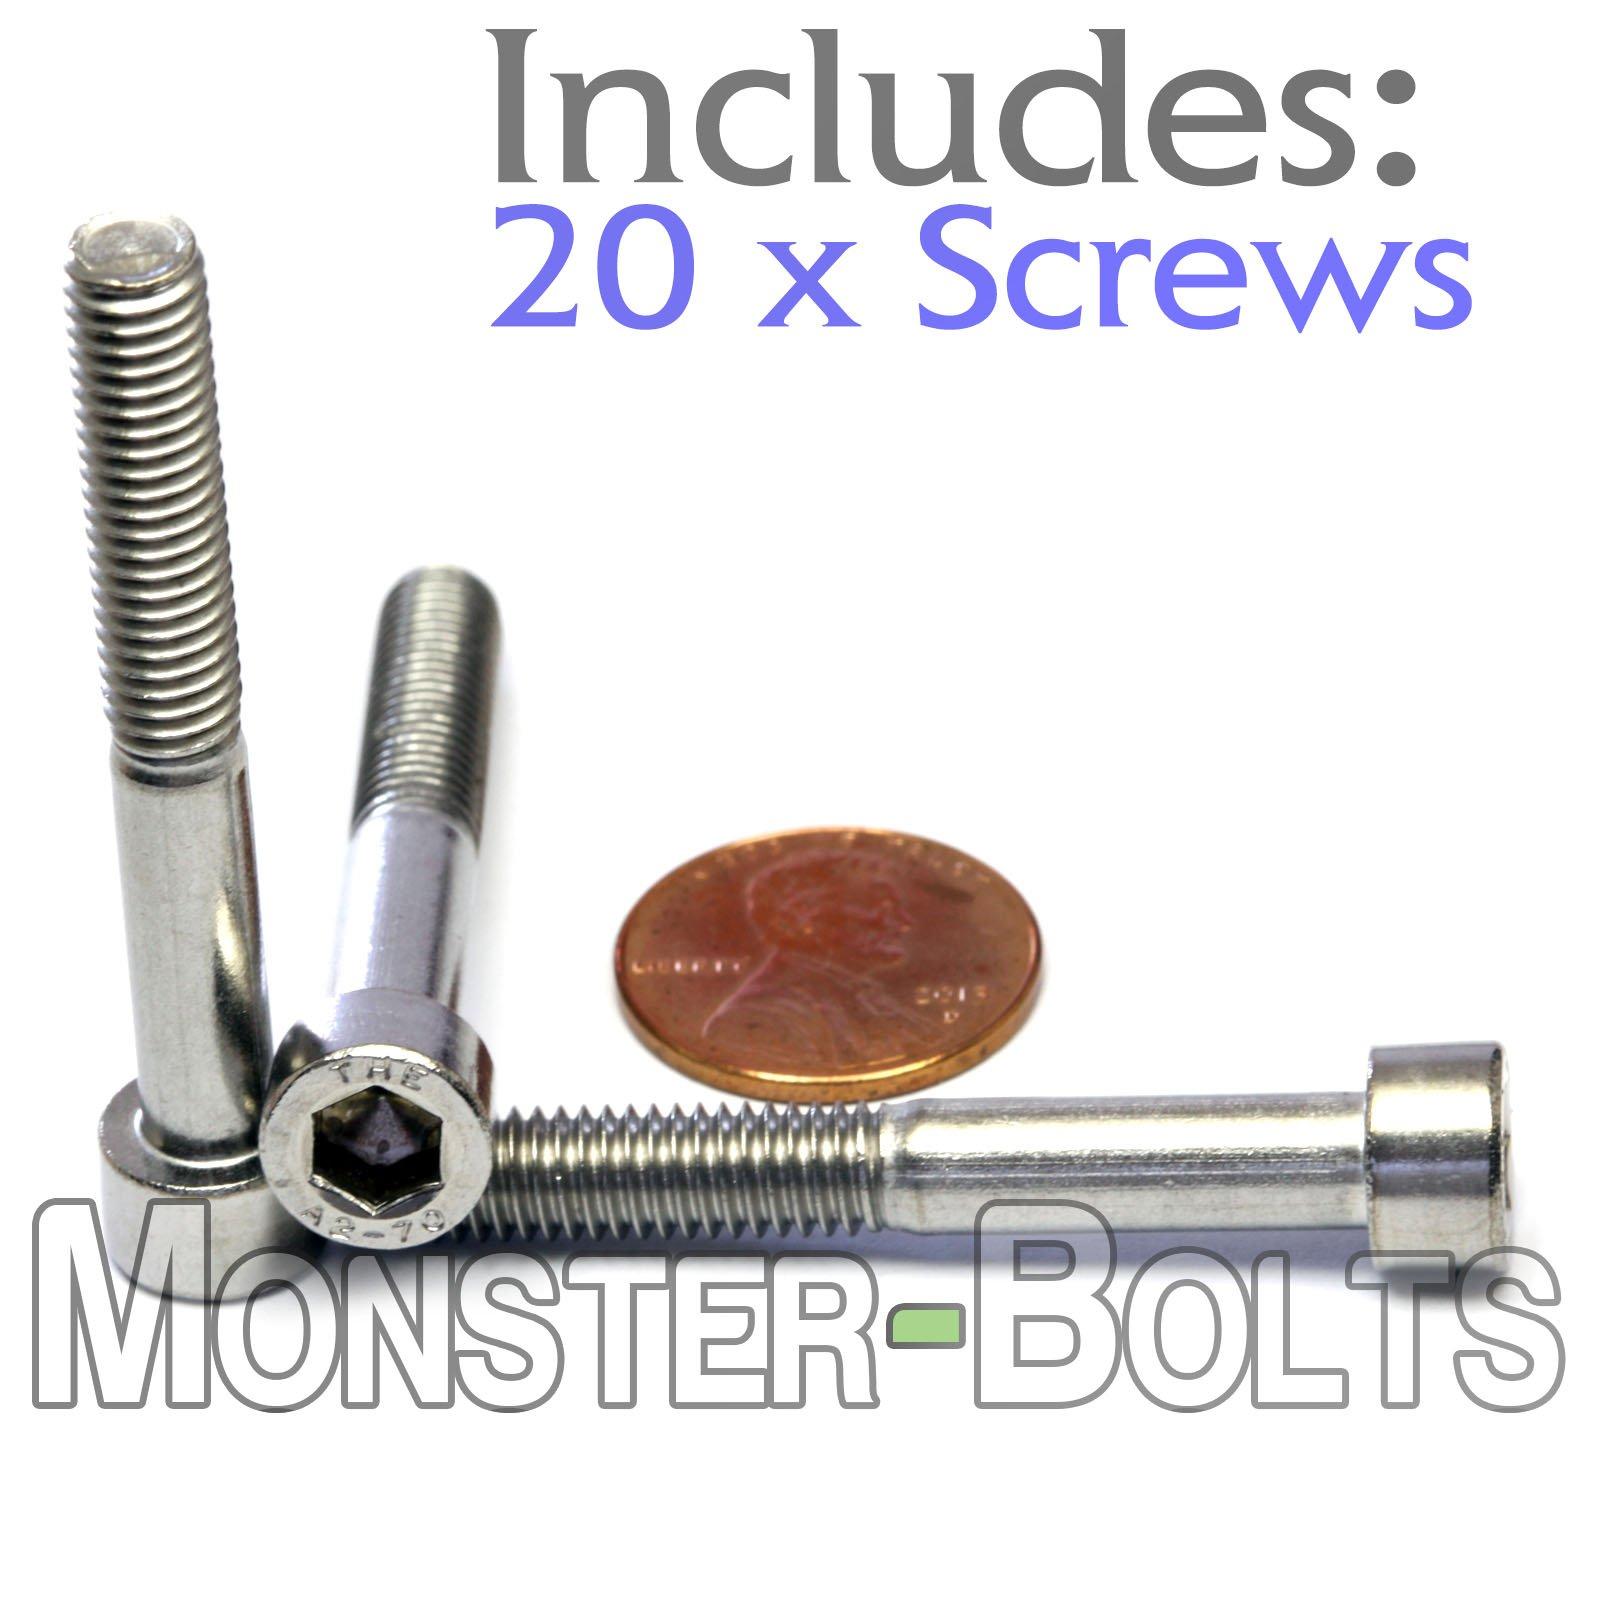 (20) M6-1.0 x 45mm - Stainless Steel Socket Head Cap Screws A2-70/18-8 DIN 912 - MonsterBolts (20, M6 x 45mm)